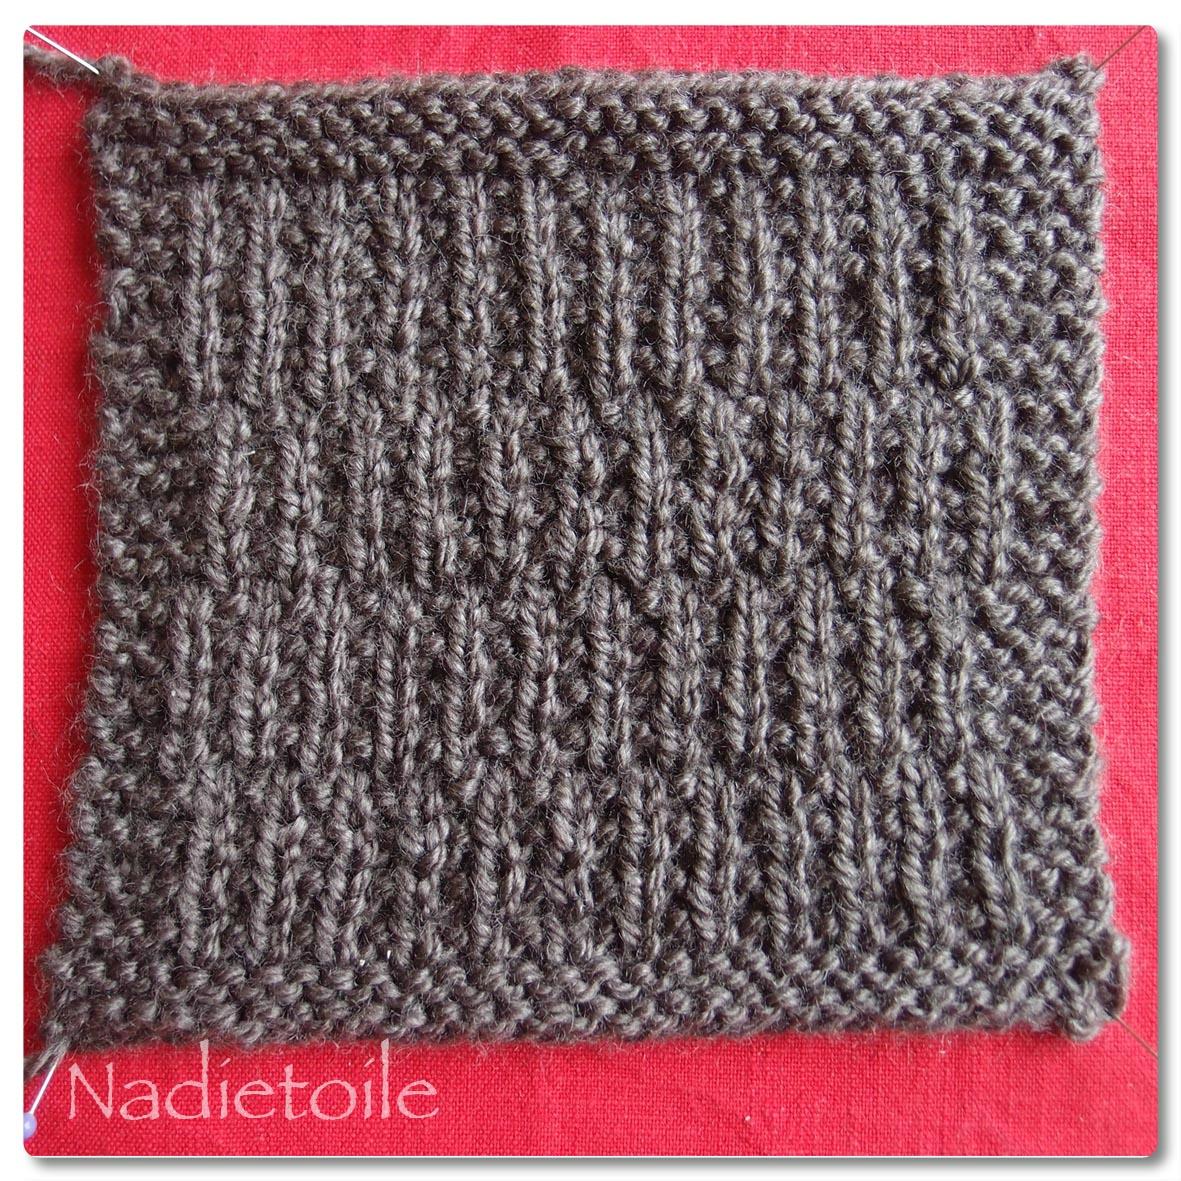 Tricoter cote 1/1